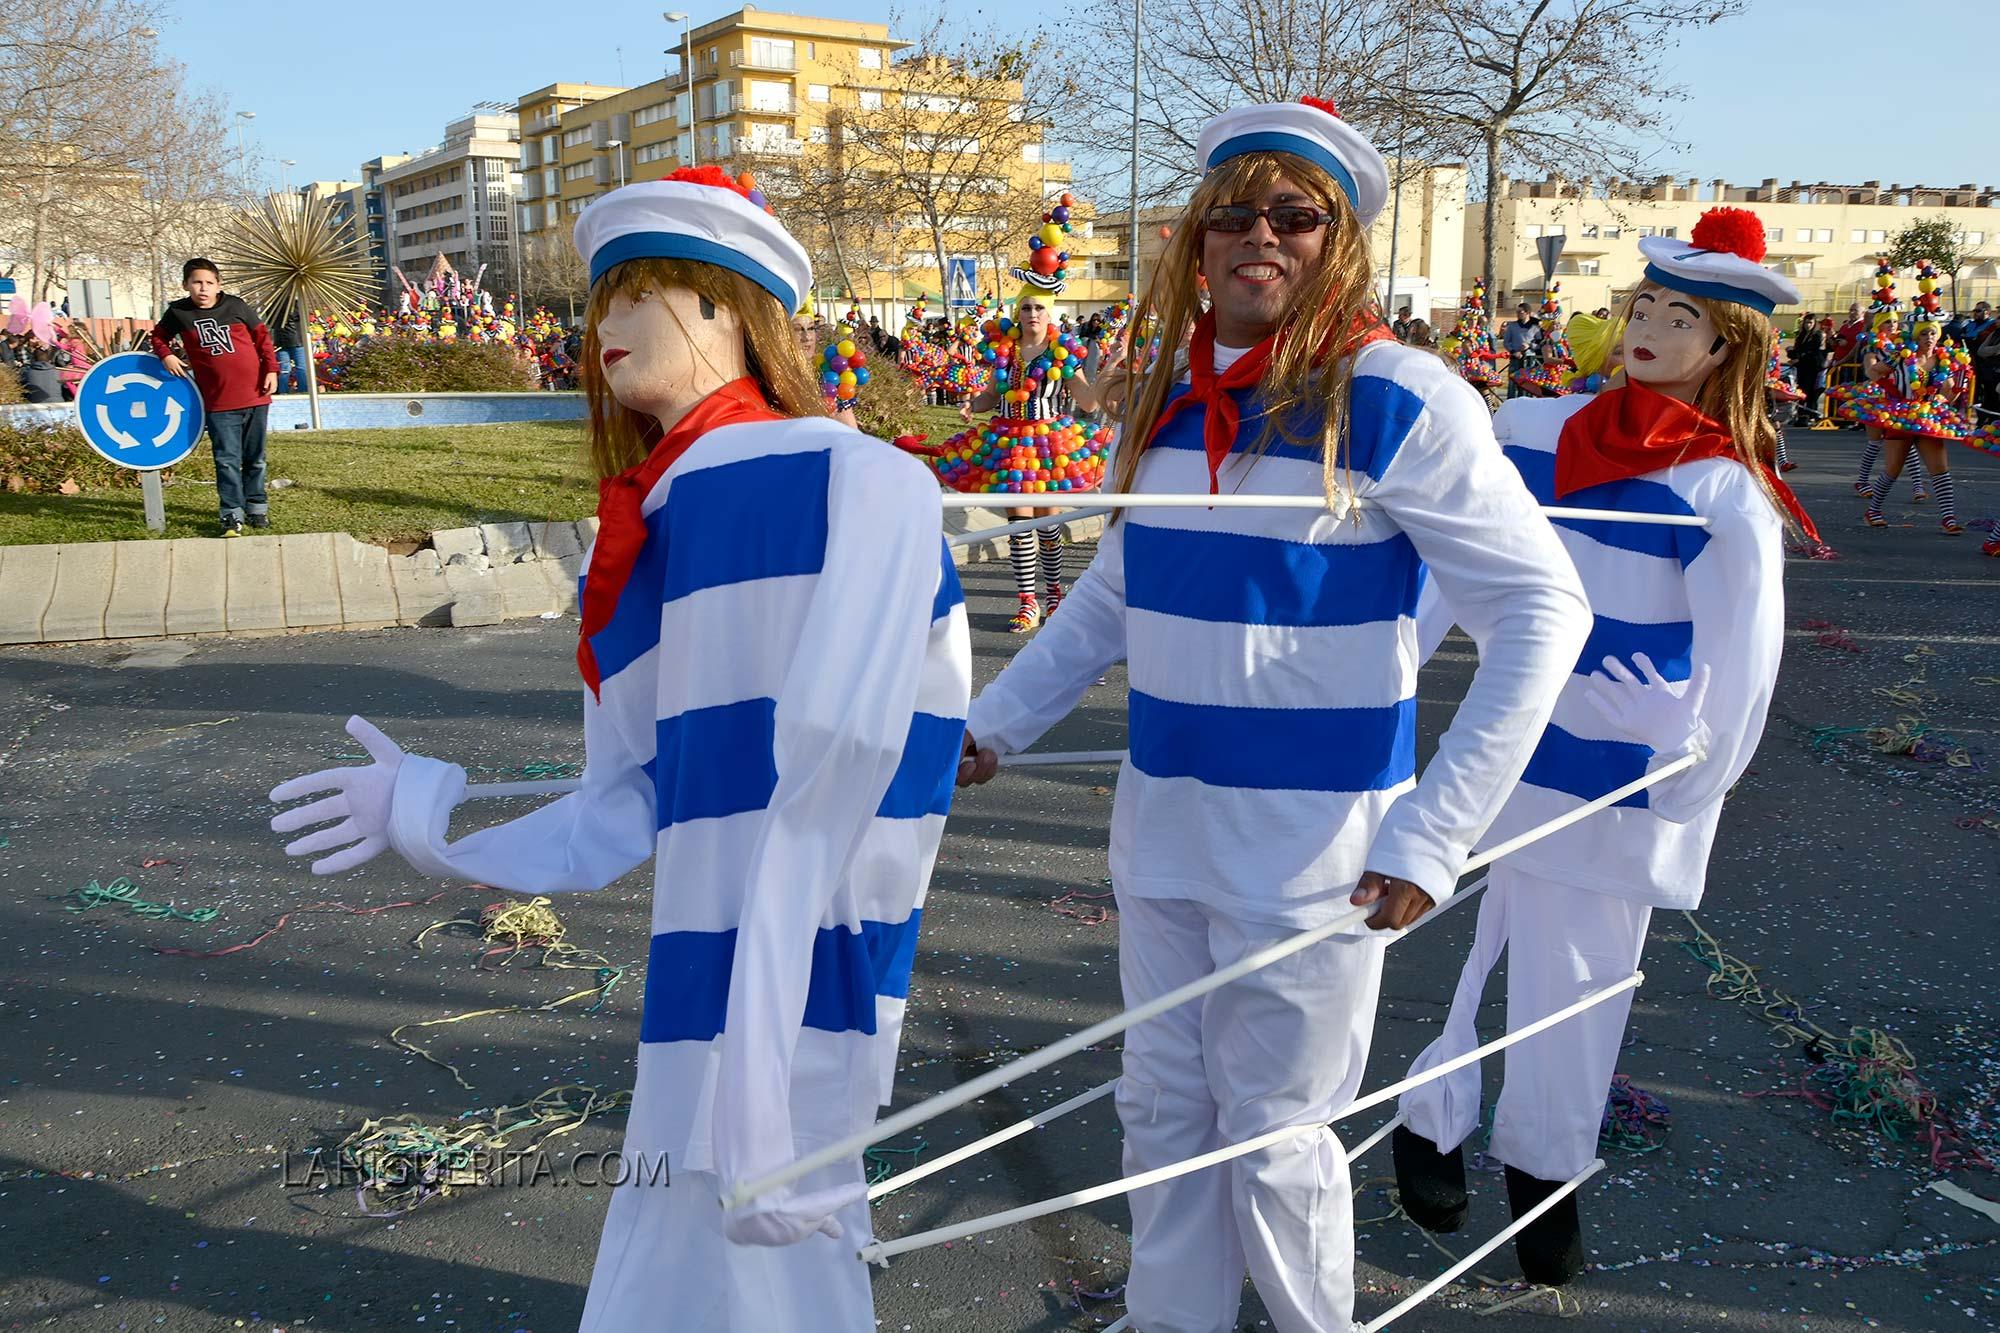 cabalgata carnaval isla cristina _DSC0619